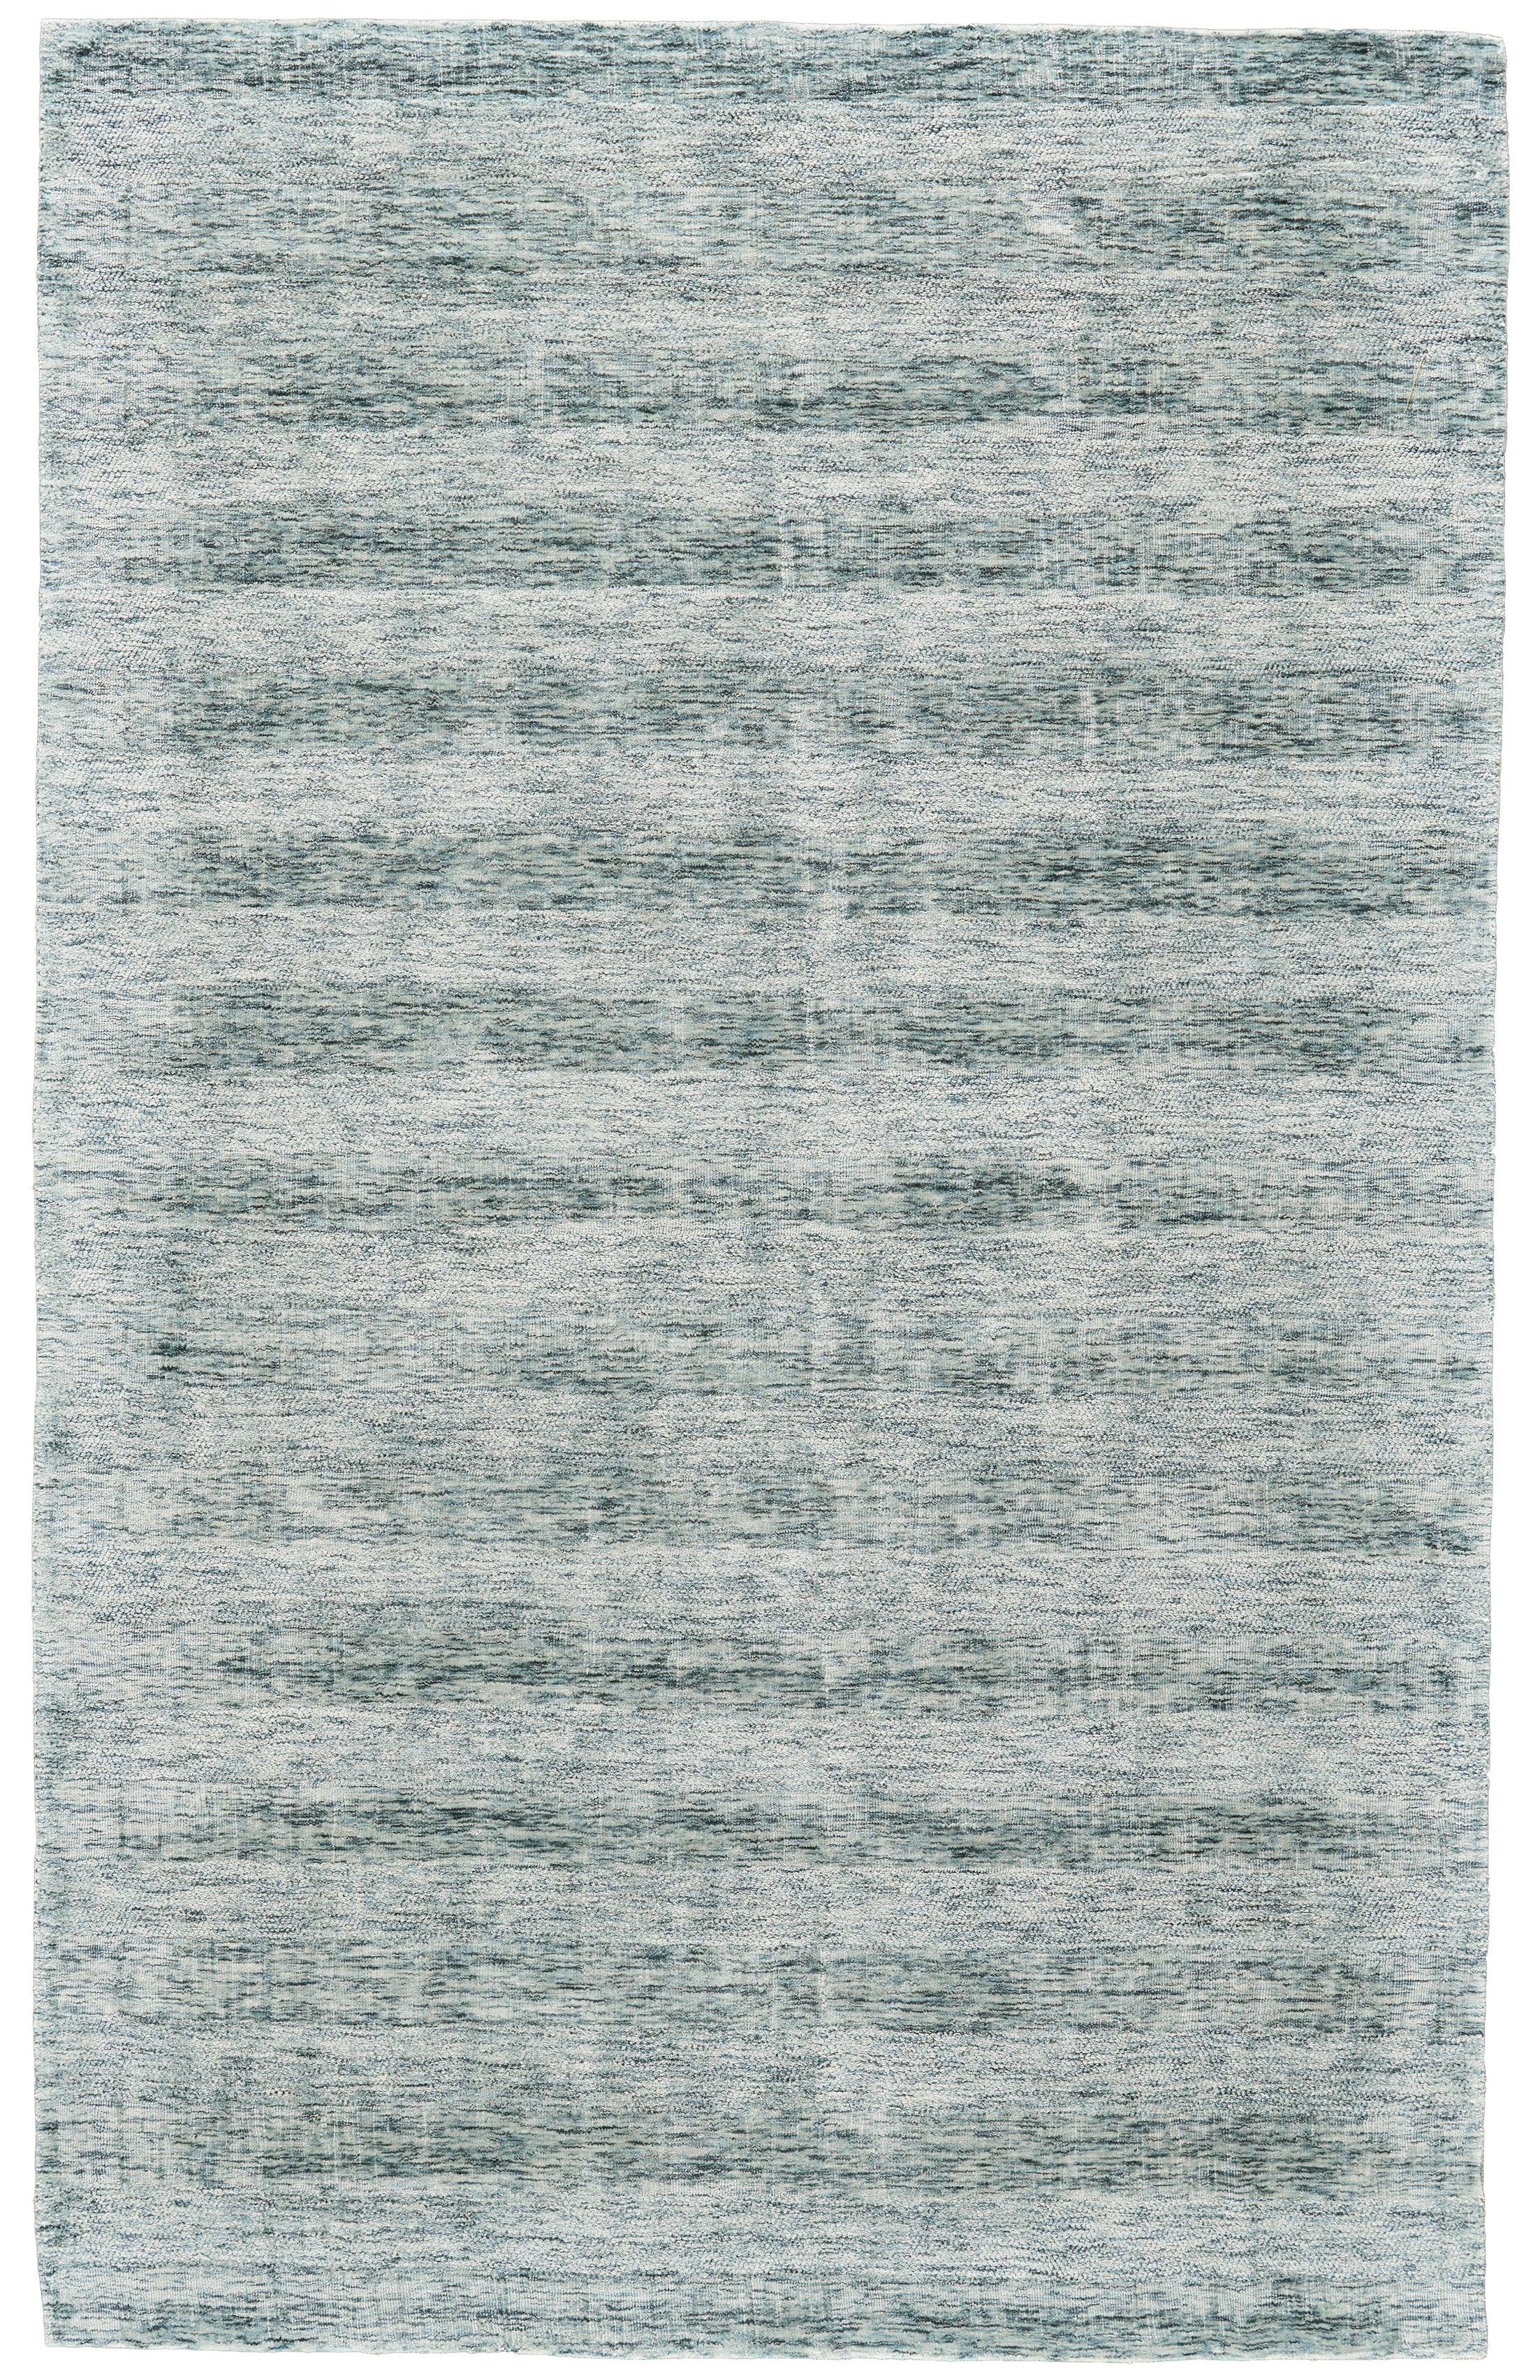 Whiten Hand-Woven Aqua Area Rug Rug Size: Rectangle 9'6